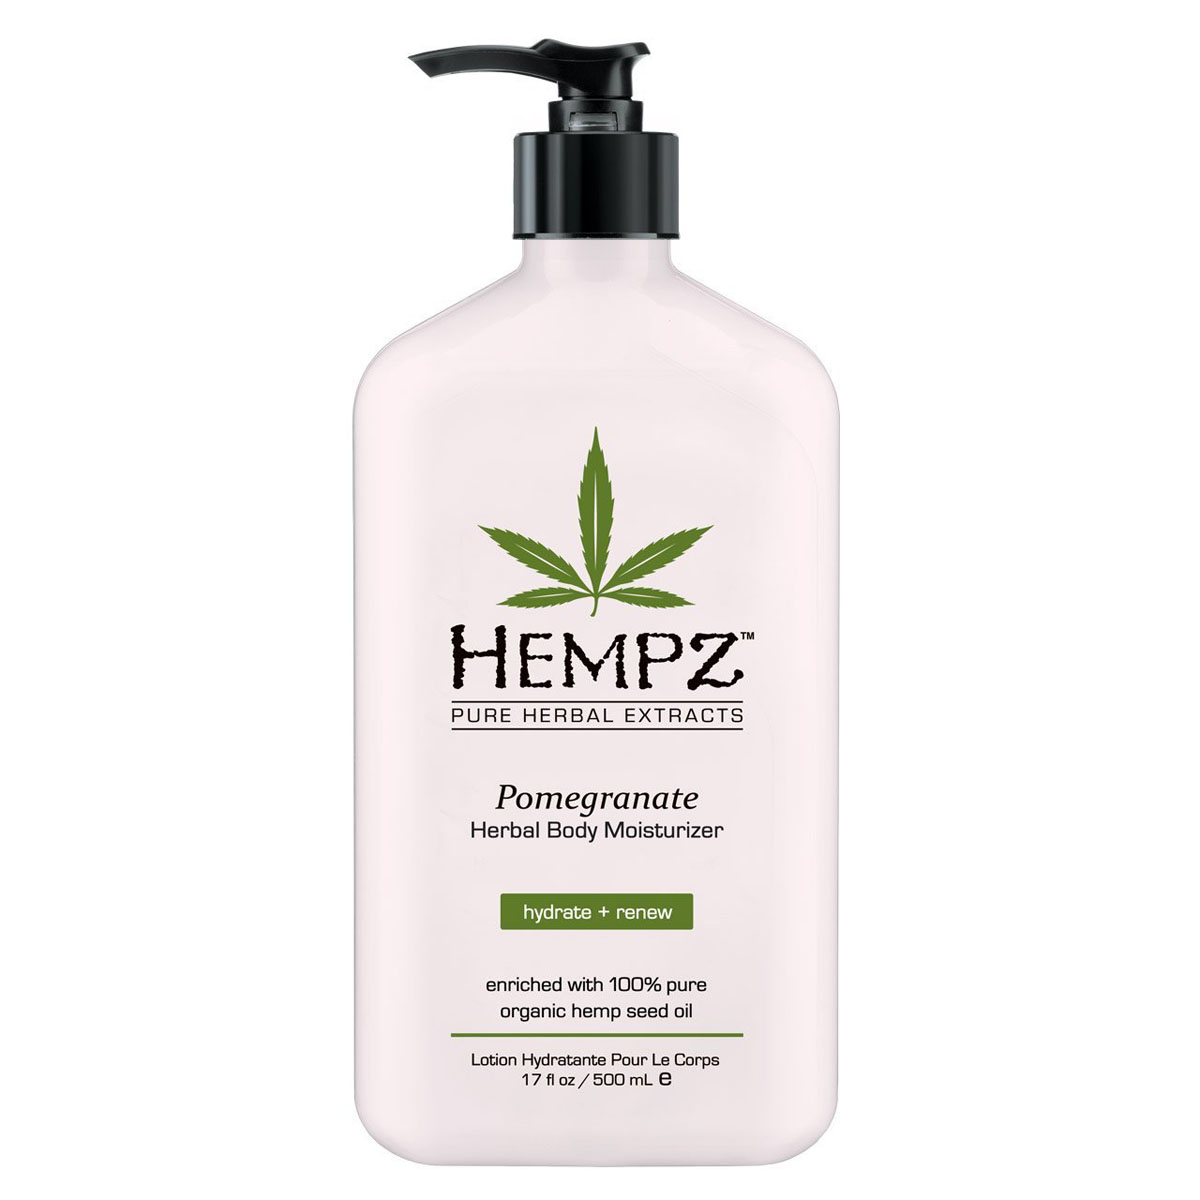 Hempz Молочко для тела увлажняющее с ганатом Pomegranate Herbal Body Moistyrizer 500 мл hempz гель для душа с ганатом pomegranate body wash 250 мл